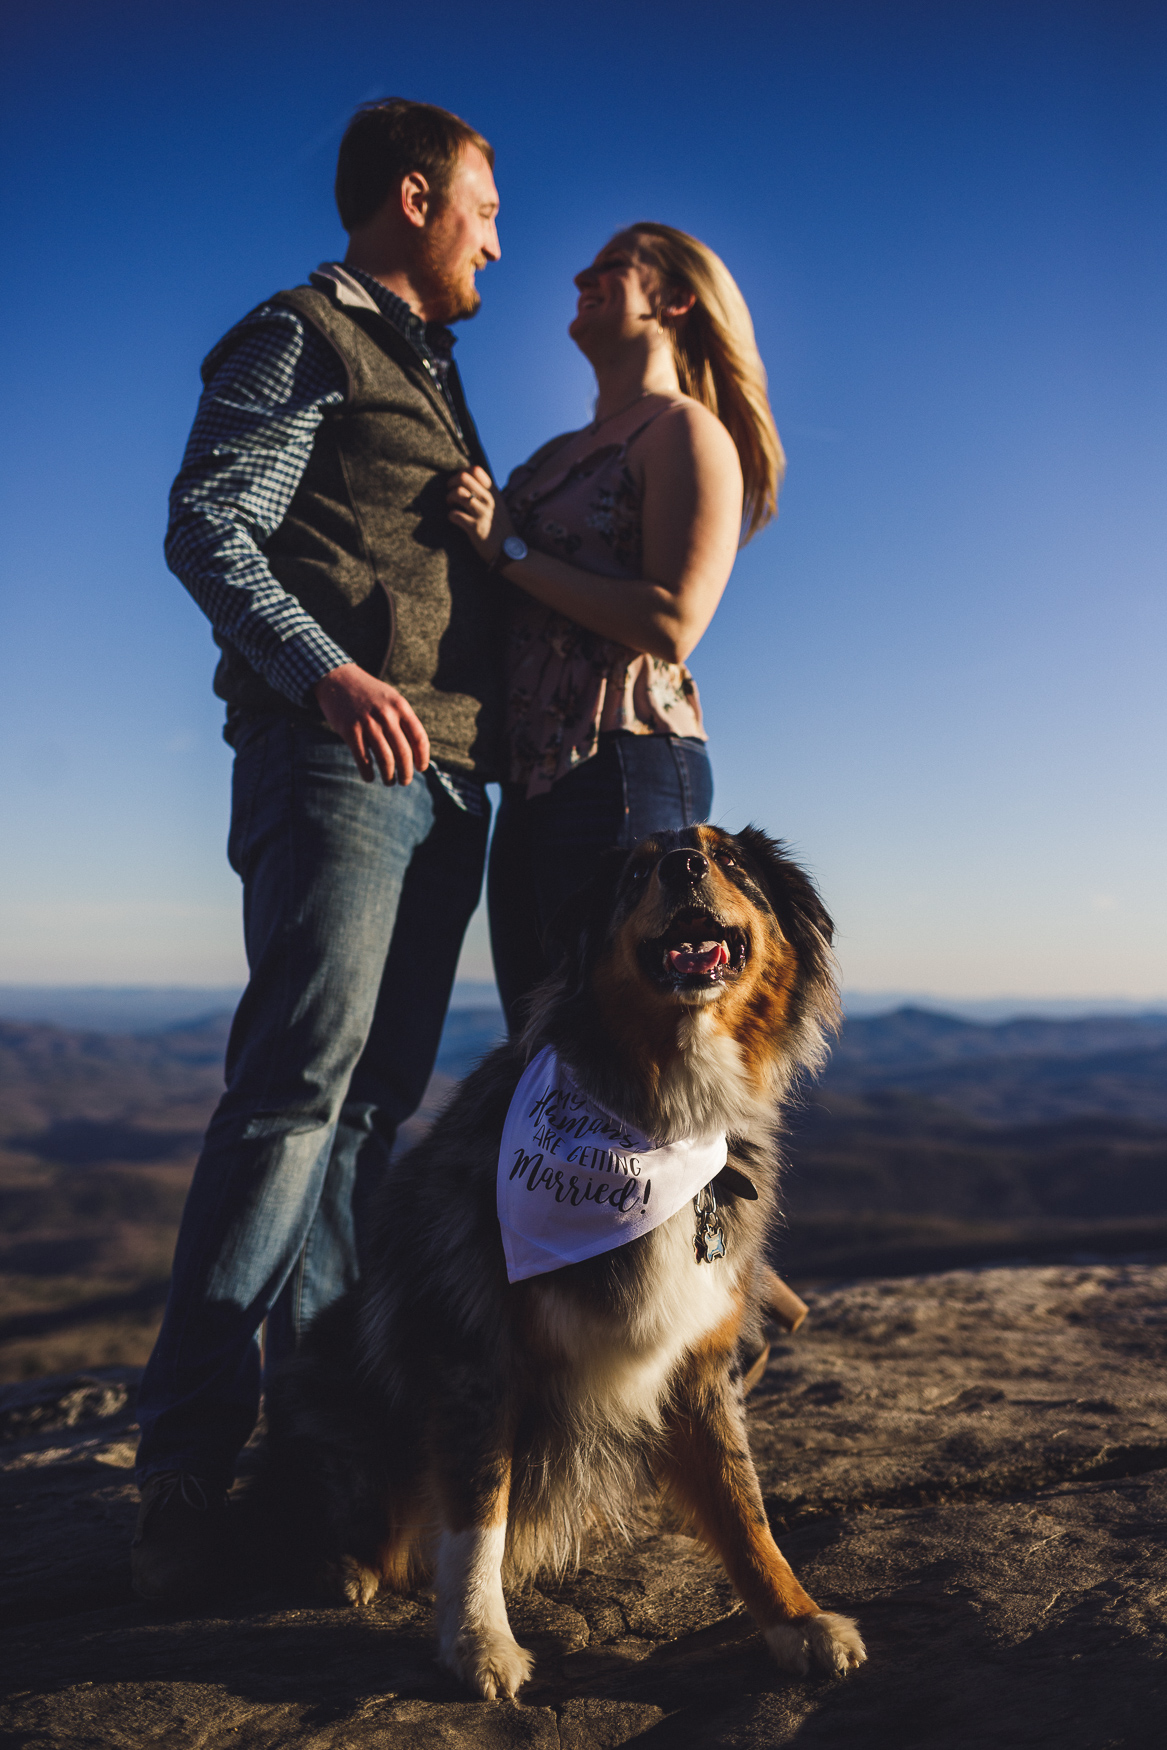 dog engagement photos, rough ridge overlook, charlotte engagement session, charlotte wedding photographer, rough ridge engagement session, north carolina wedding photographer